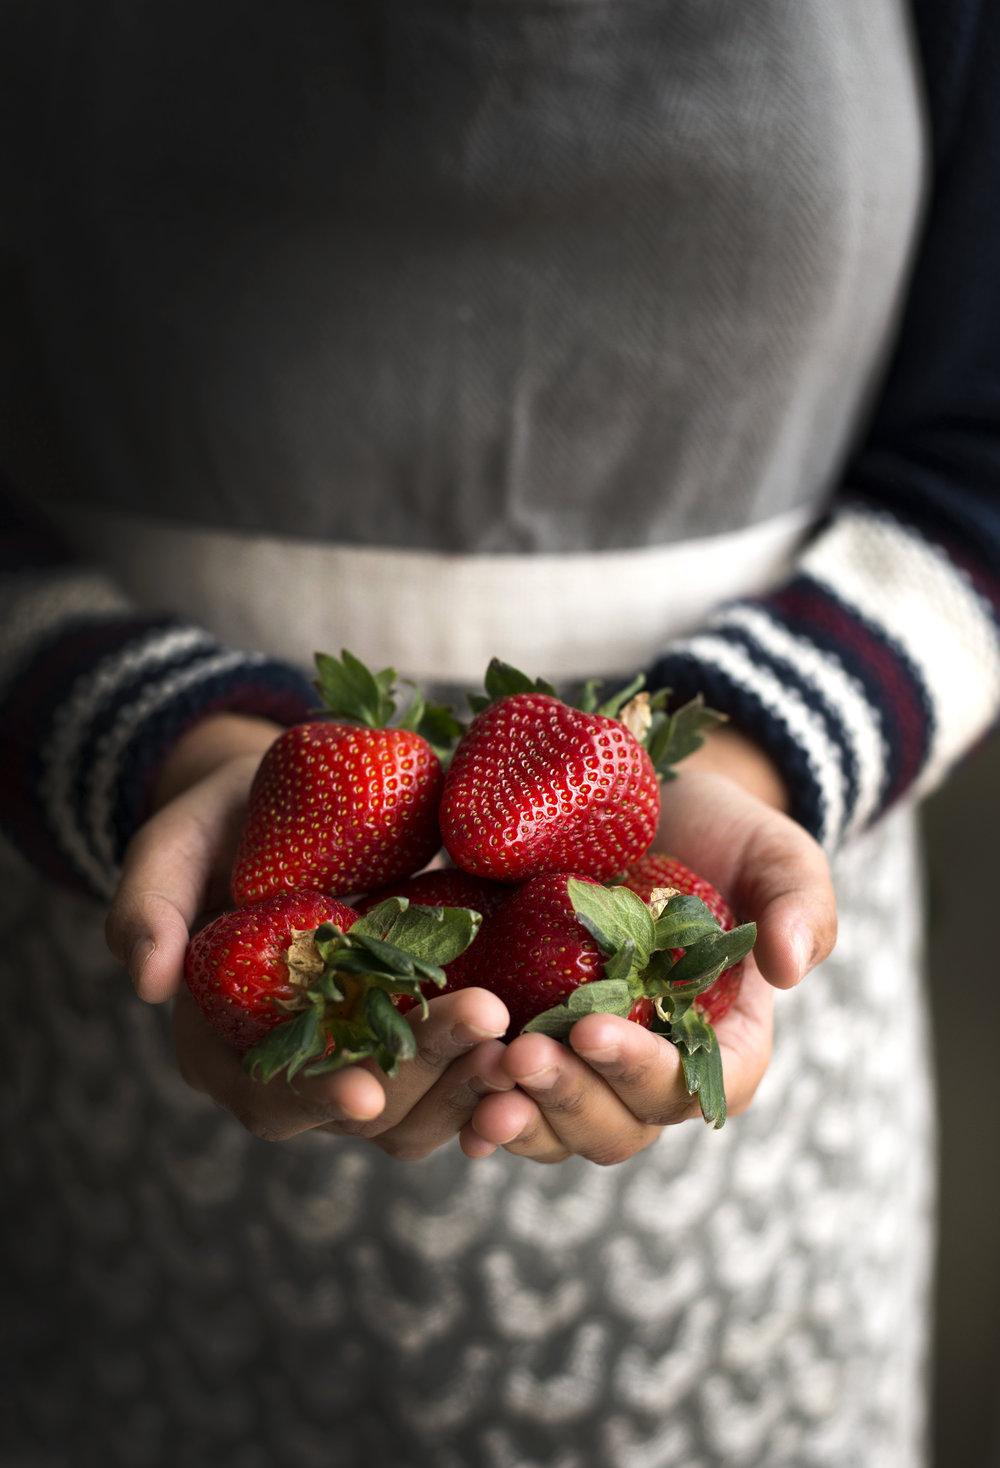 Strawberriesinhand-HR-SimiJois-2016.jpg